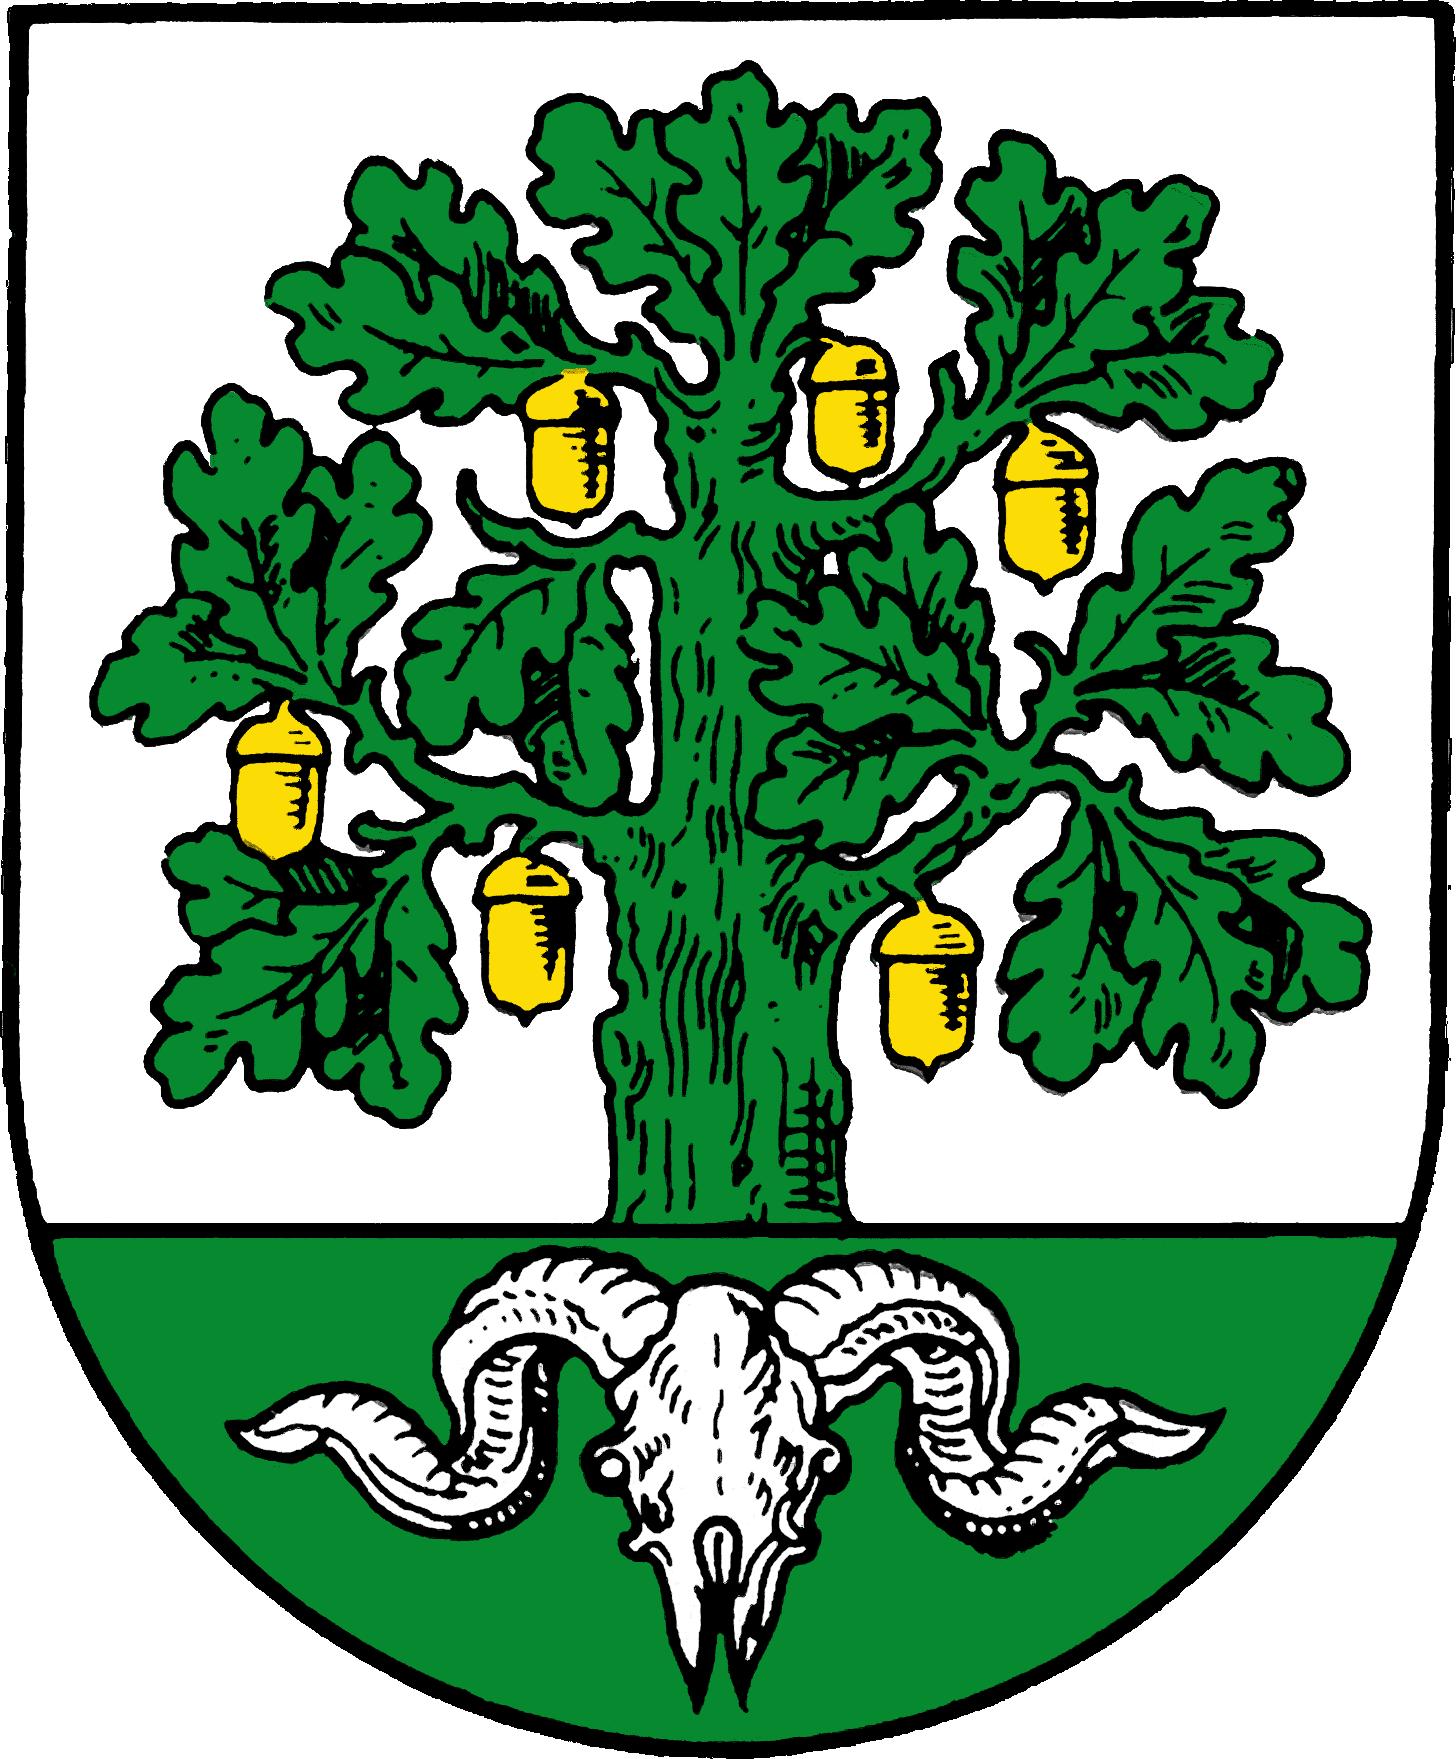 Wappen Bergen (Landkreis Celle)